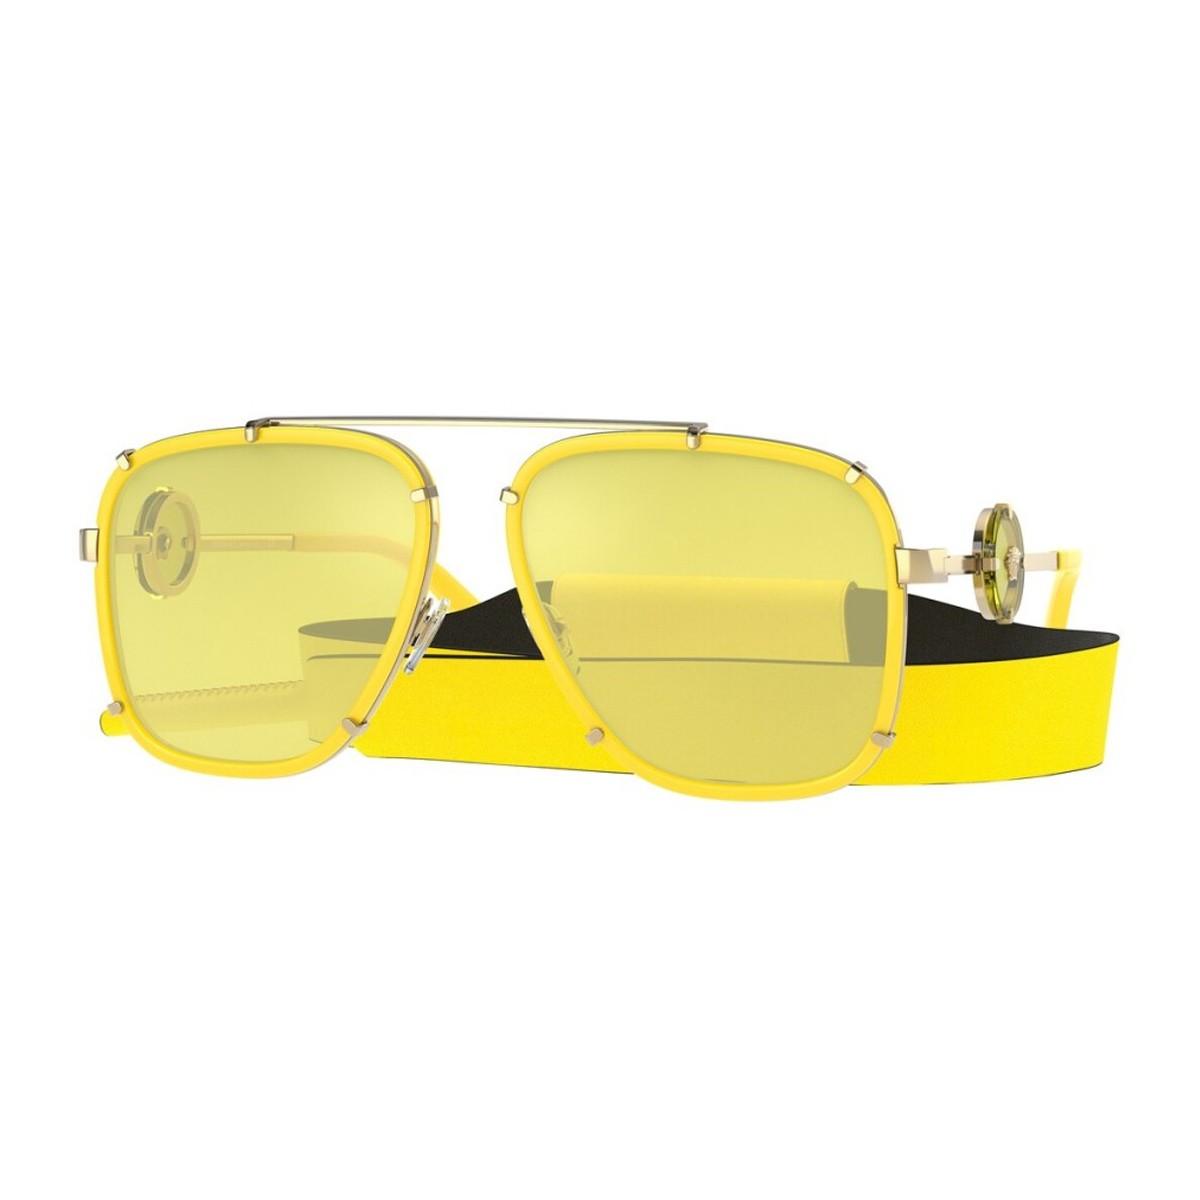 Versace OVE2233 | Unisex sunglasses